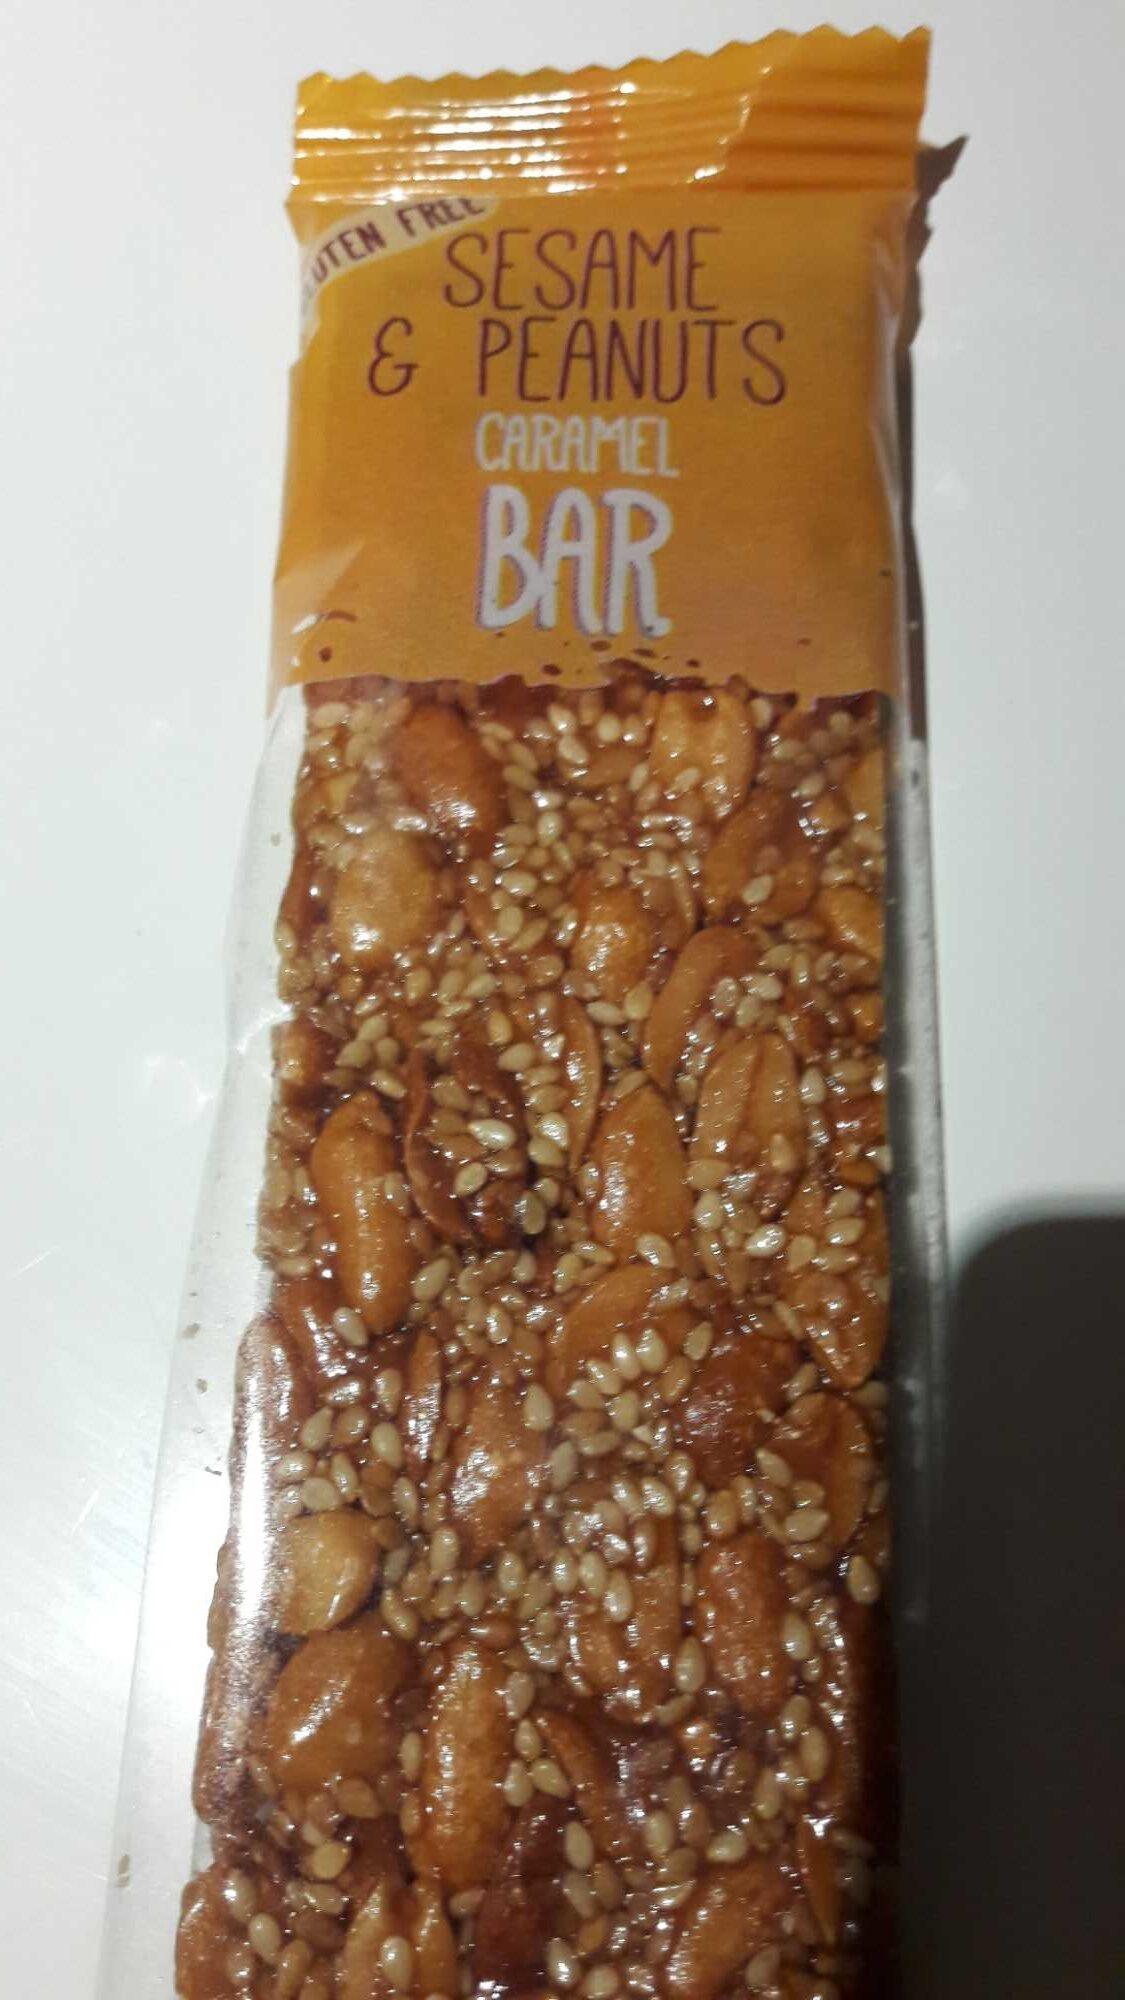 Barre de sesame au caramel - Produit - fr